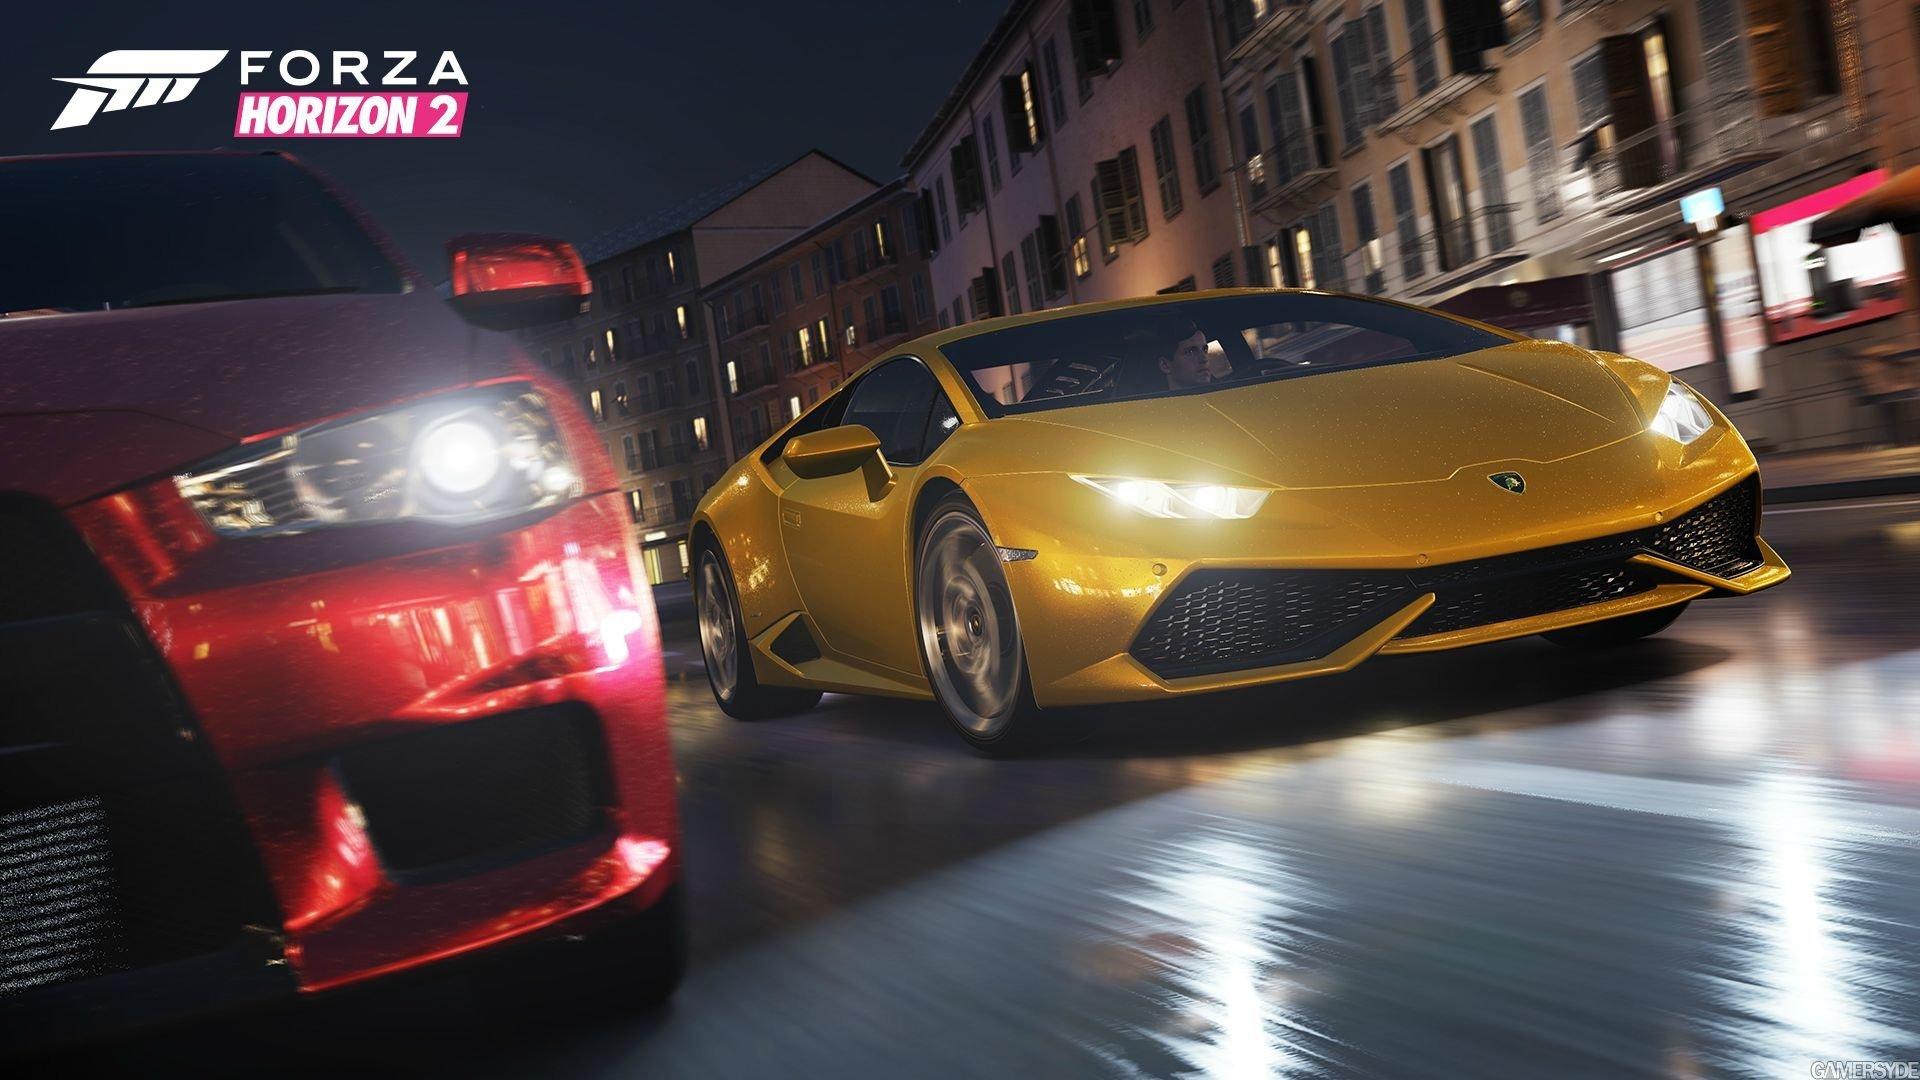 145 Forza Horizon 2 HD Wallpapers